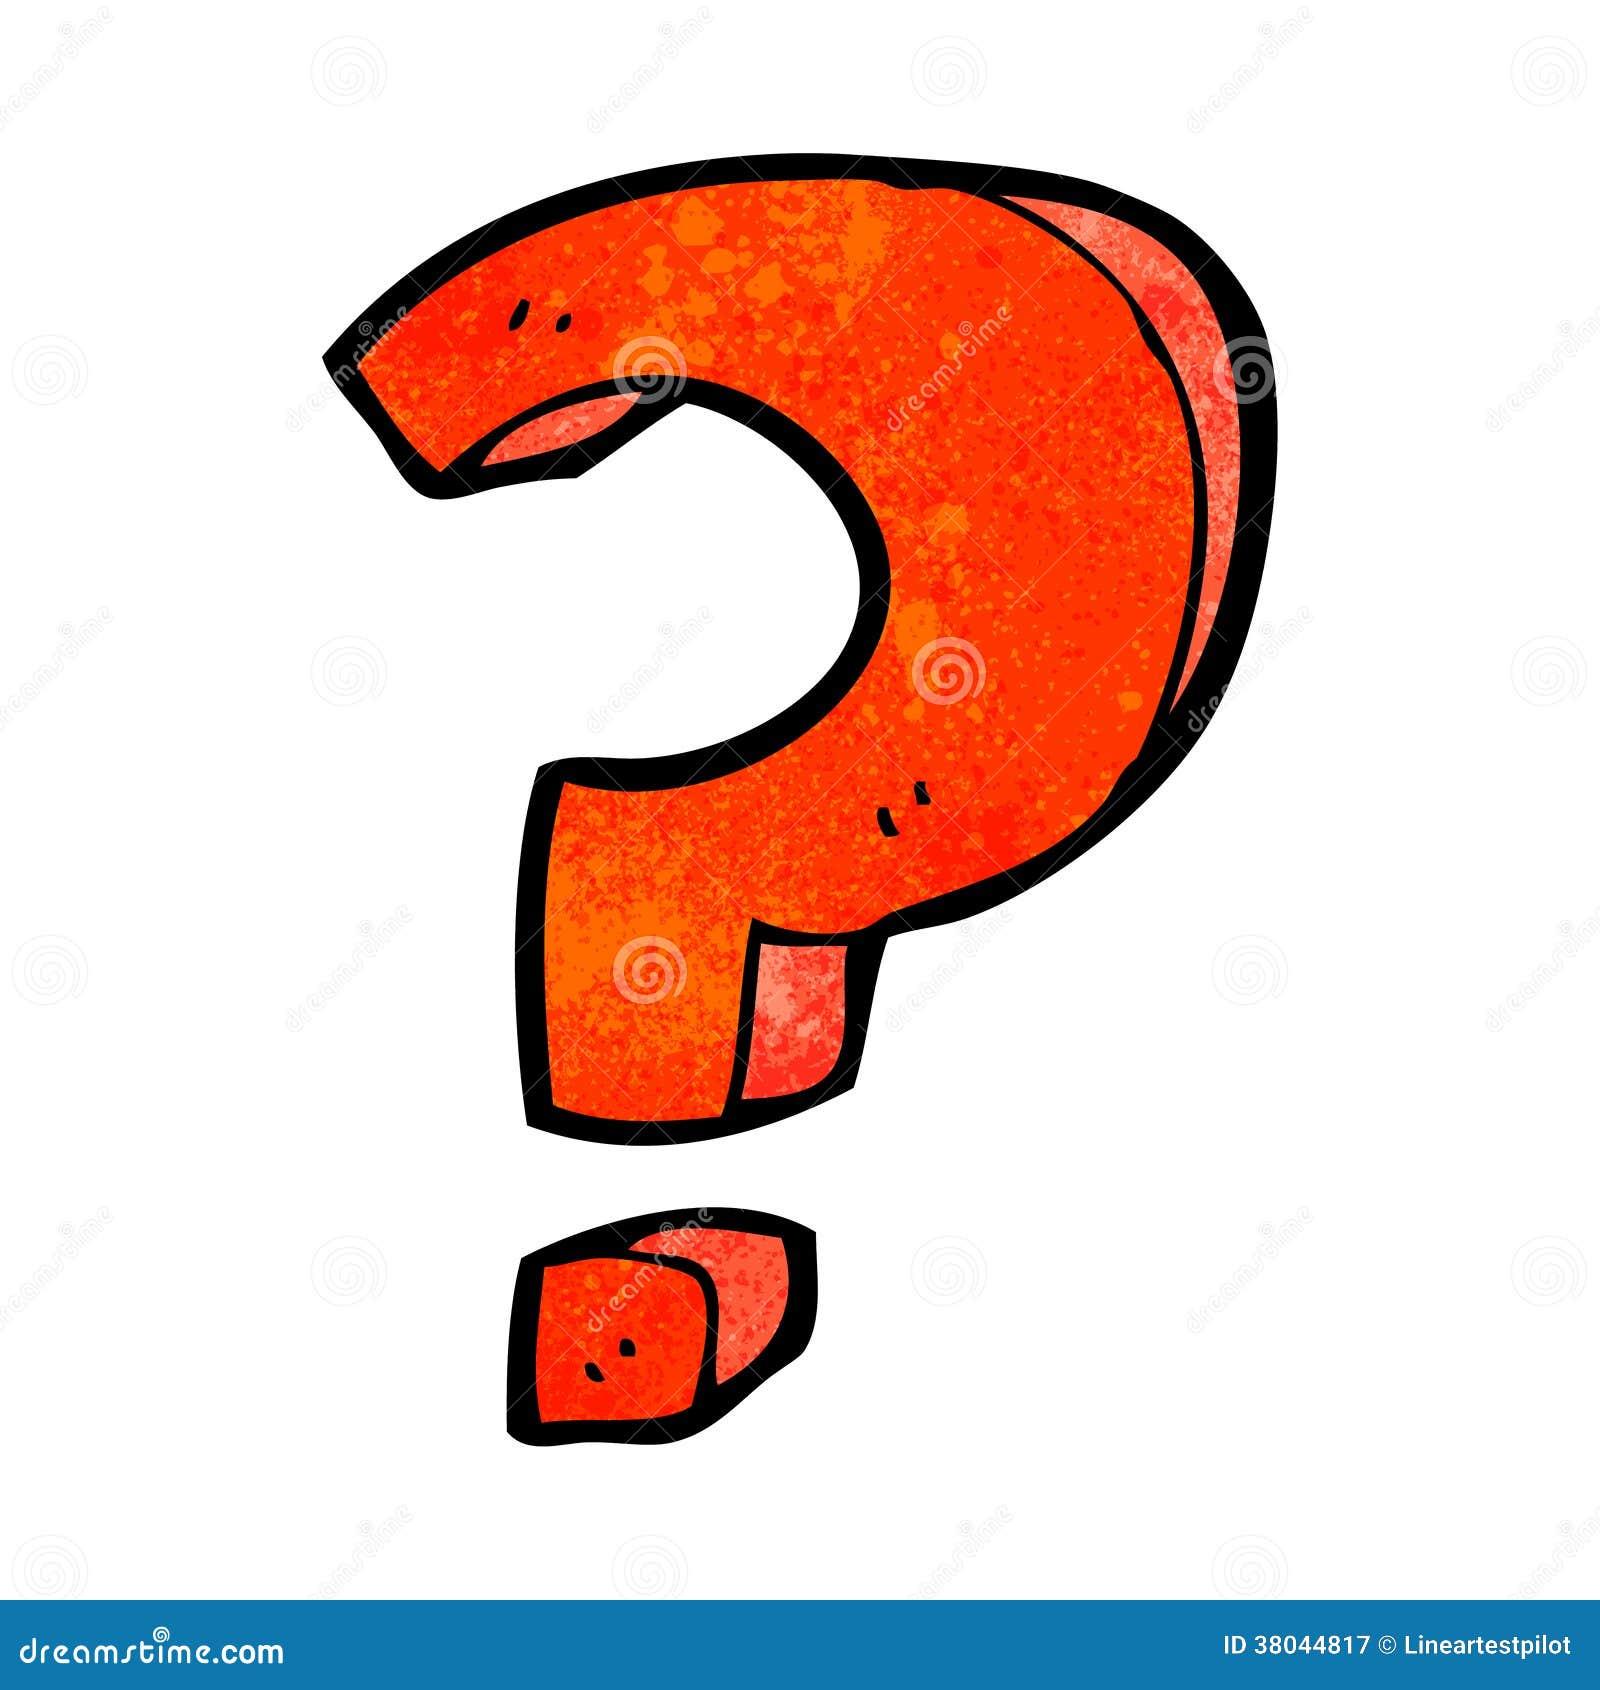 Cartoon Question Mark Stock Vector Illustration Of Hand 38044817